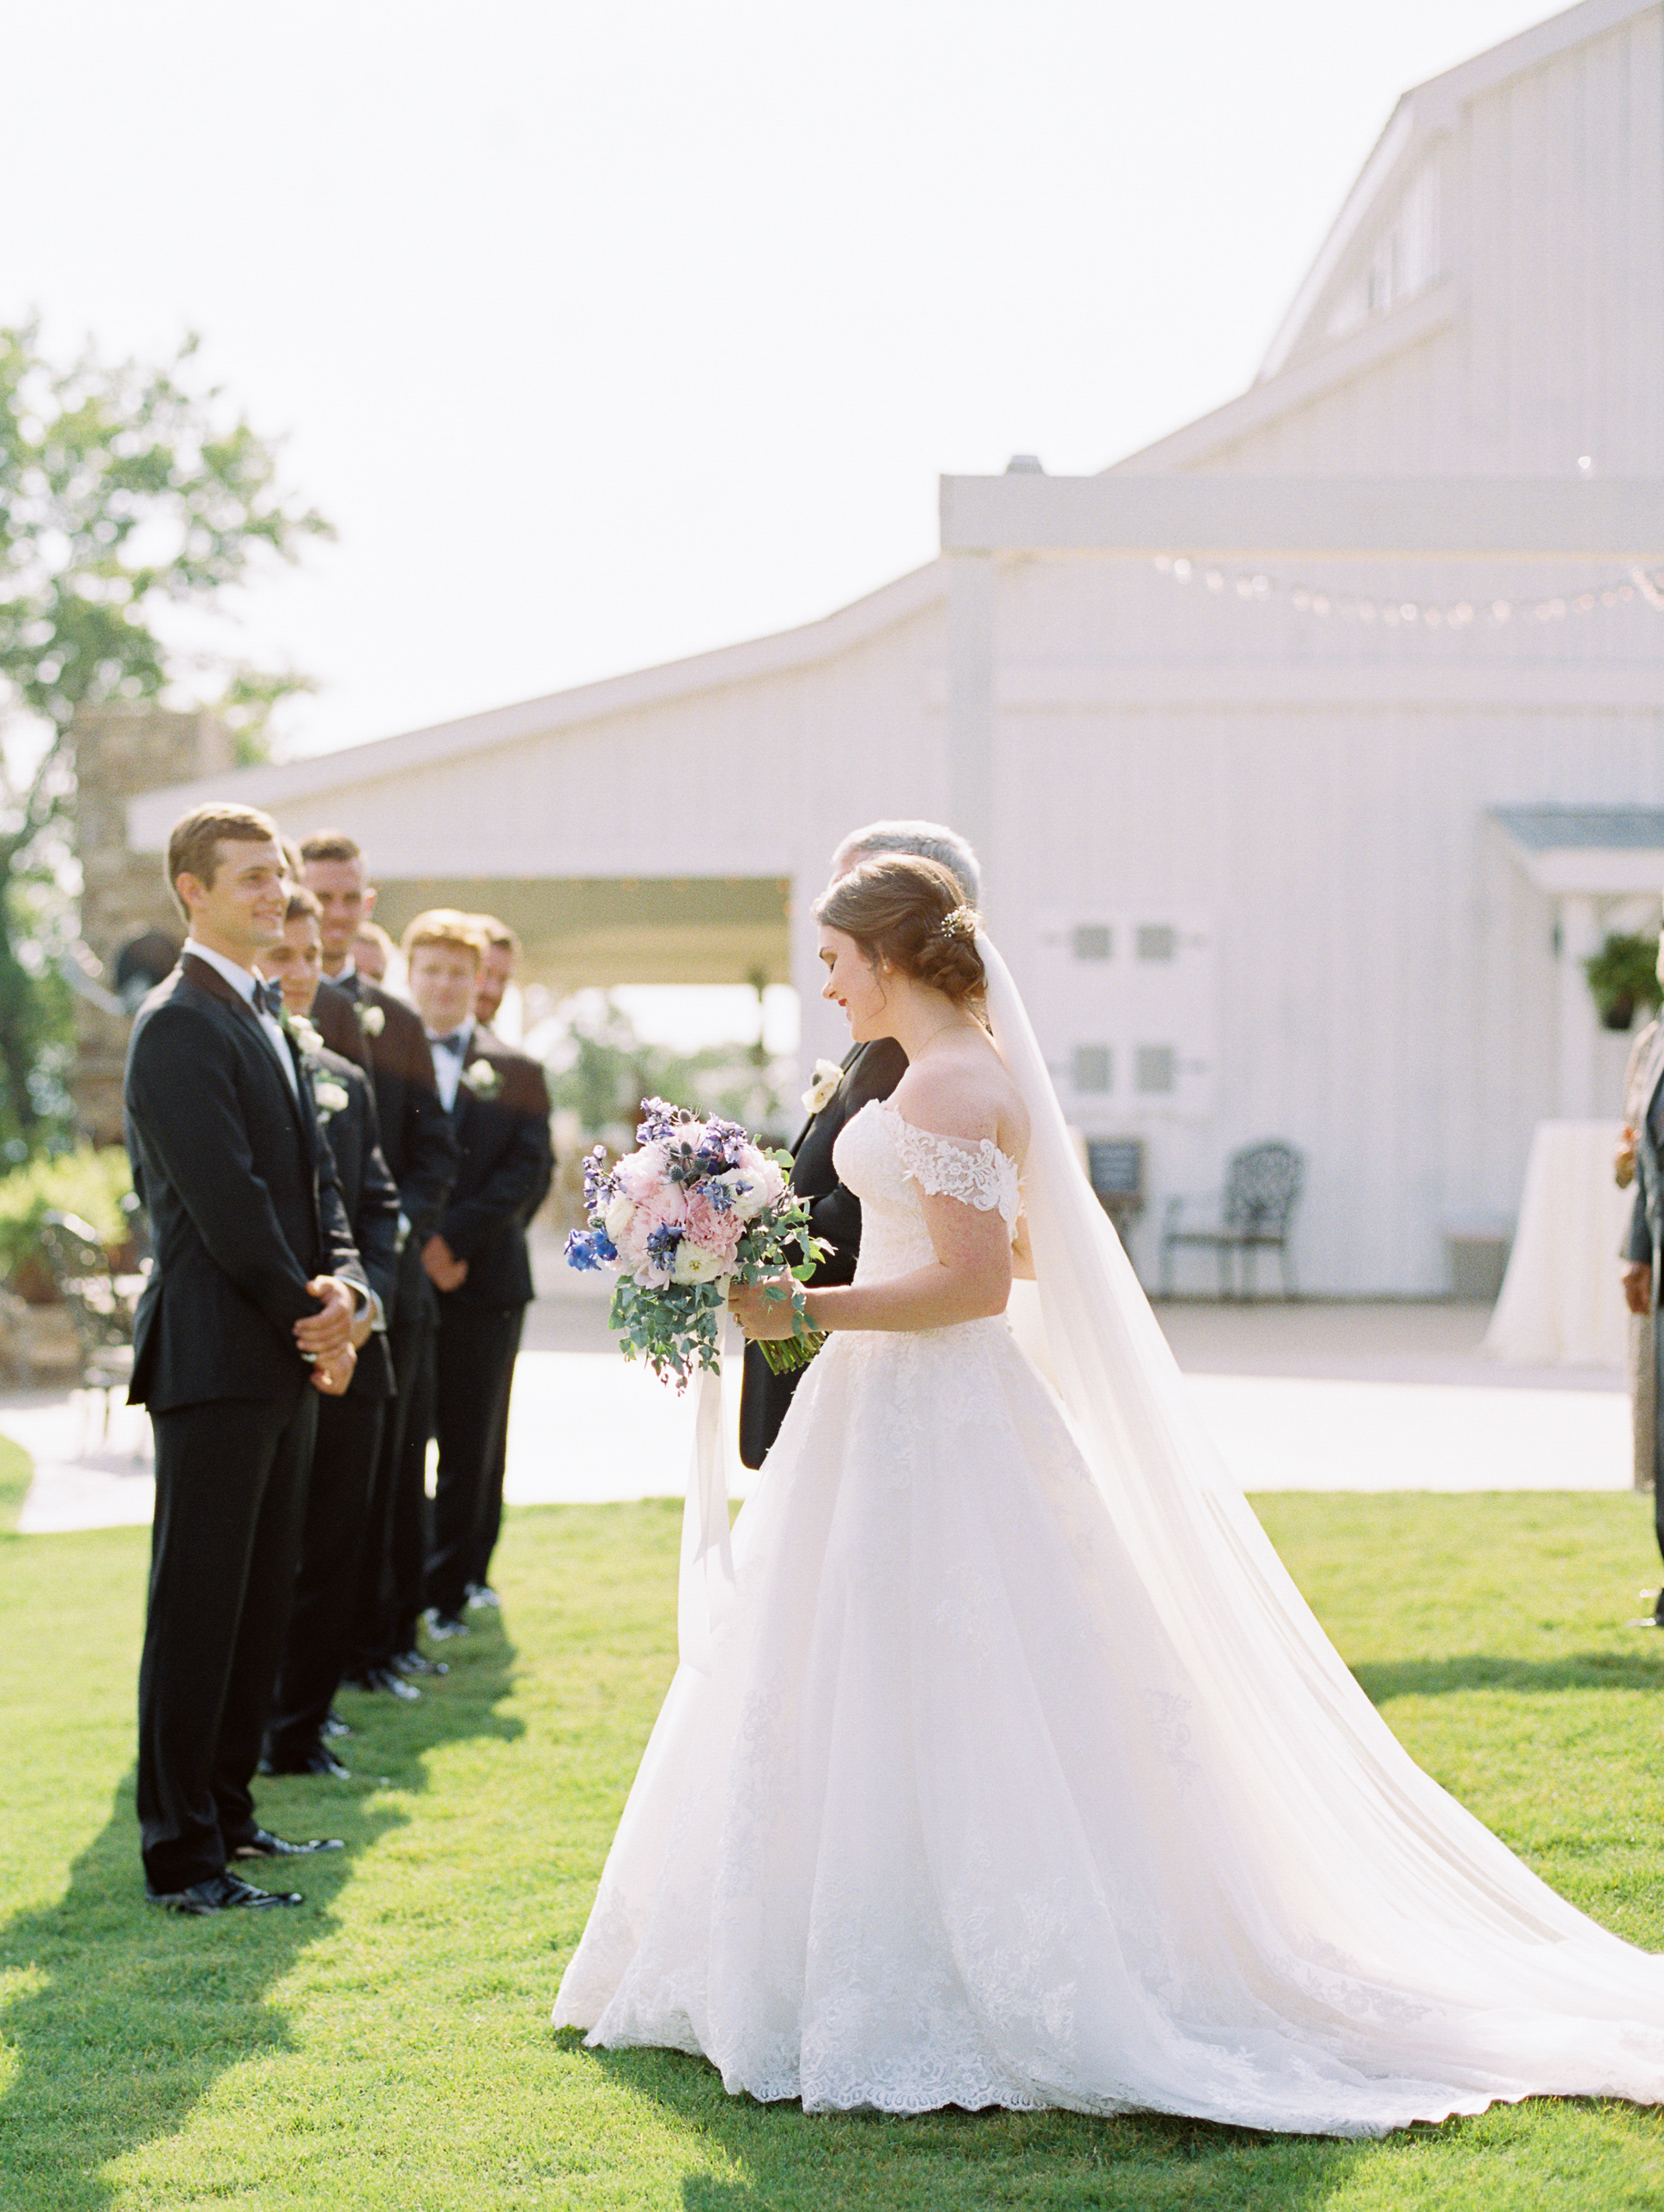 barn-at-tatum-acres-wedding-jasper-atlanta-wedding-photographer-fine-art-film-hannah-forsberg31.JPG